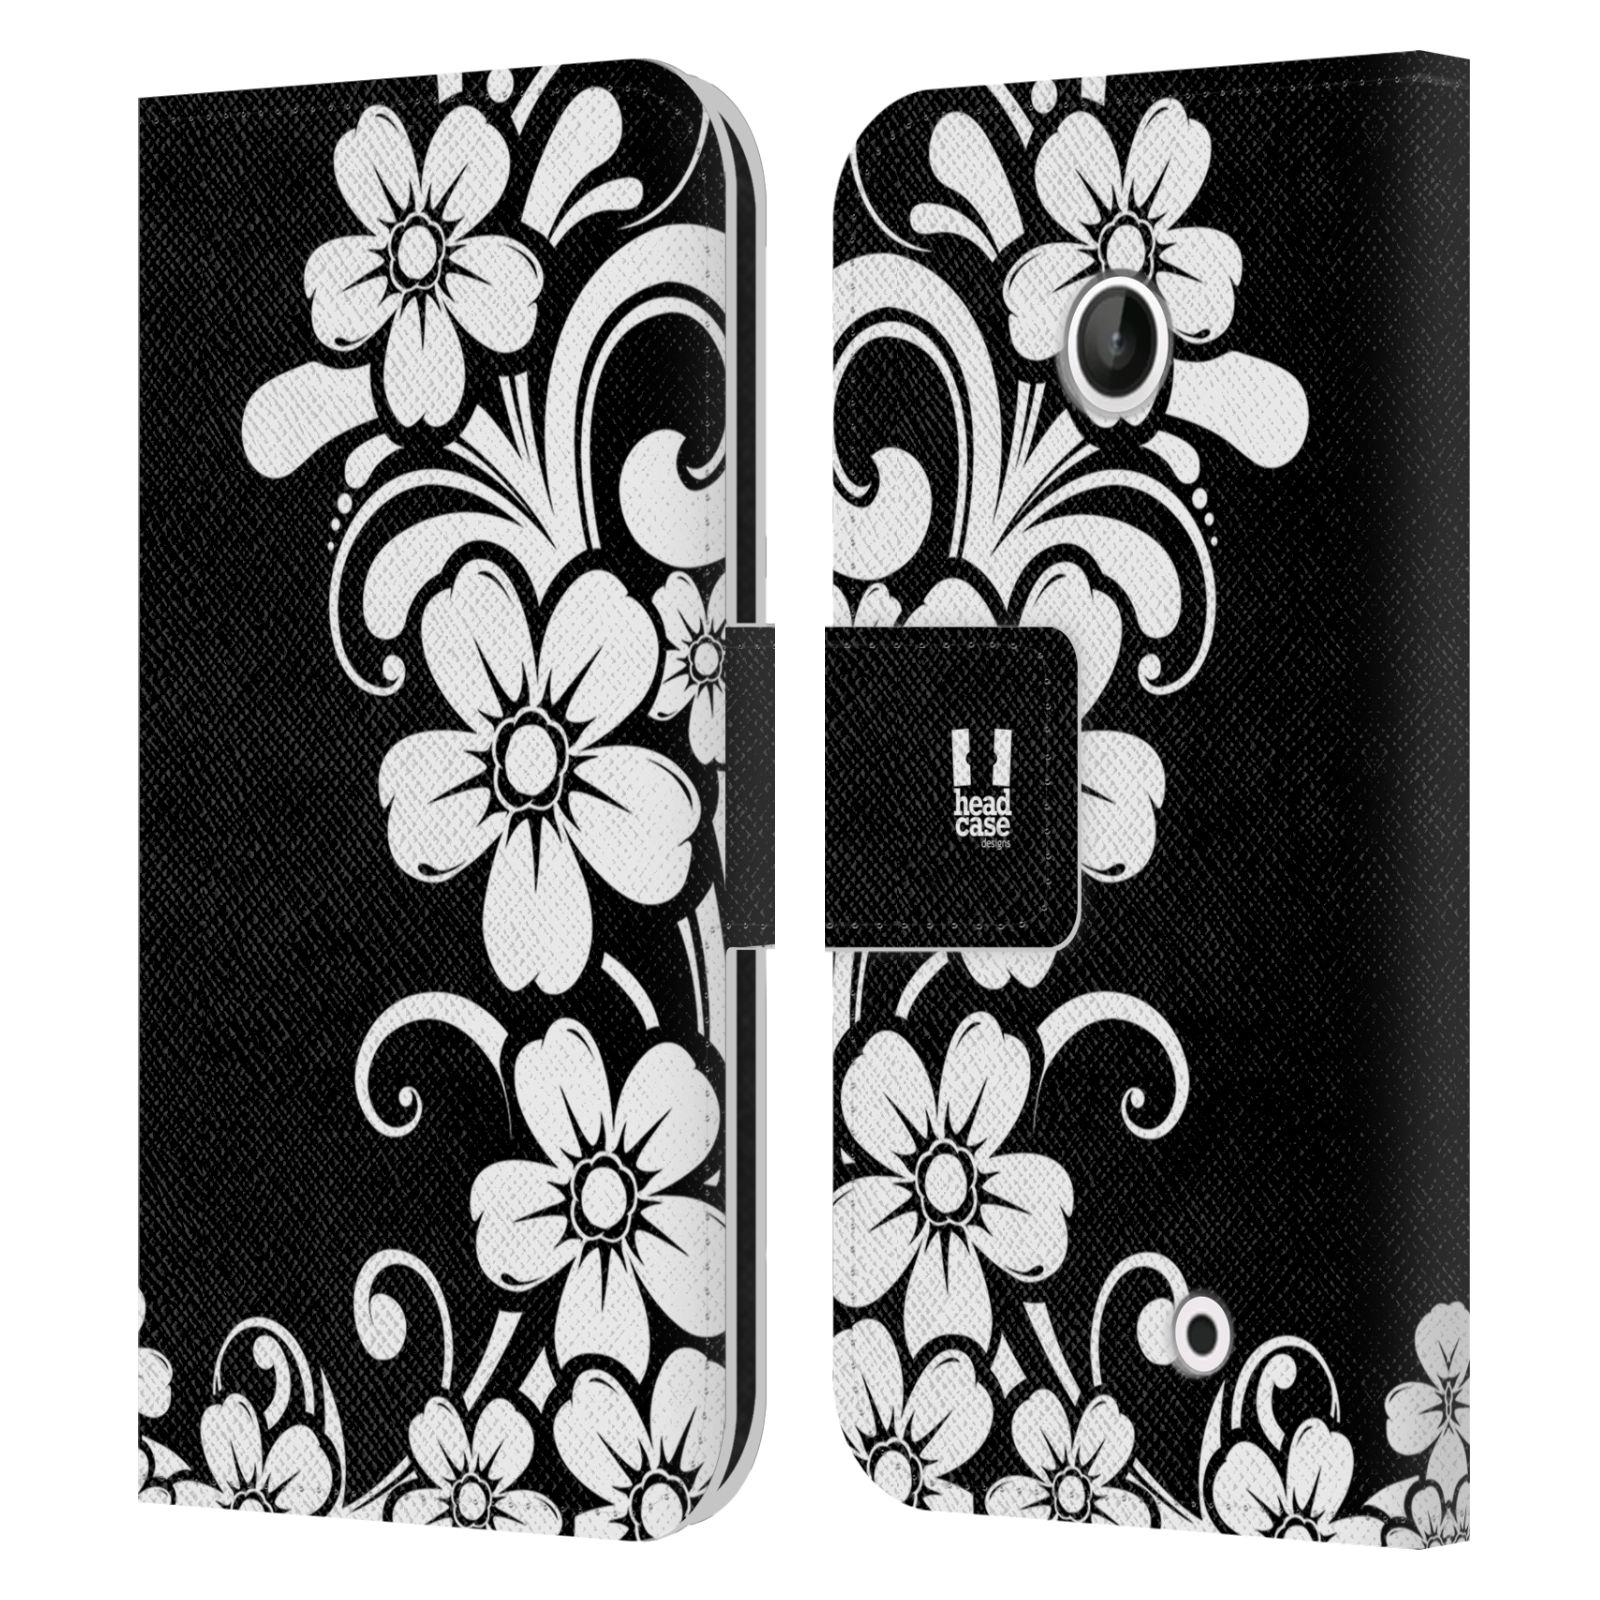 HEAD CASE Flipové pouzdro pro mobil NOKIA LUMIA 630 / LUMIA 630 DUAL ČERNOBÍLÁ KVĚTINA květ